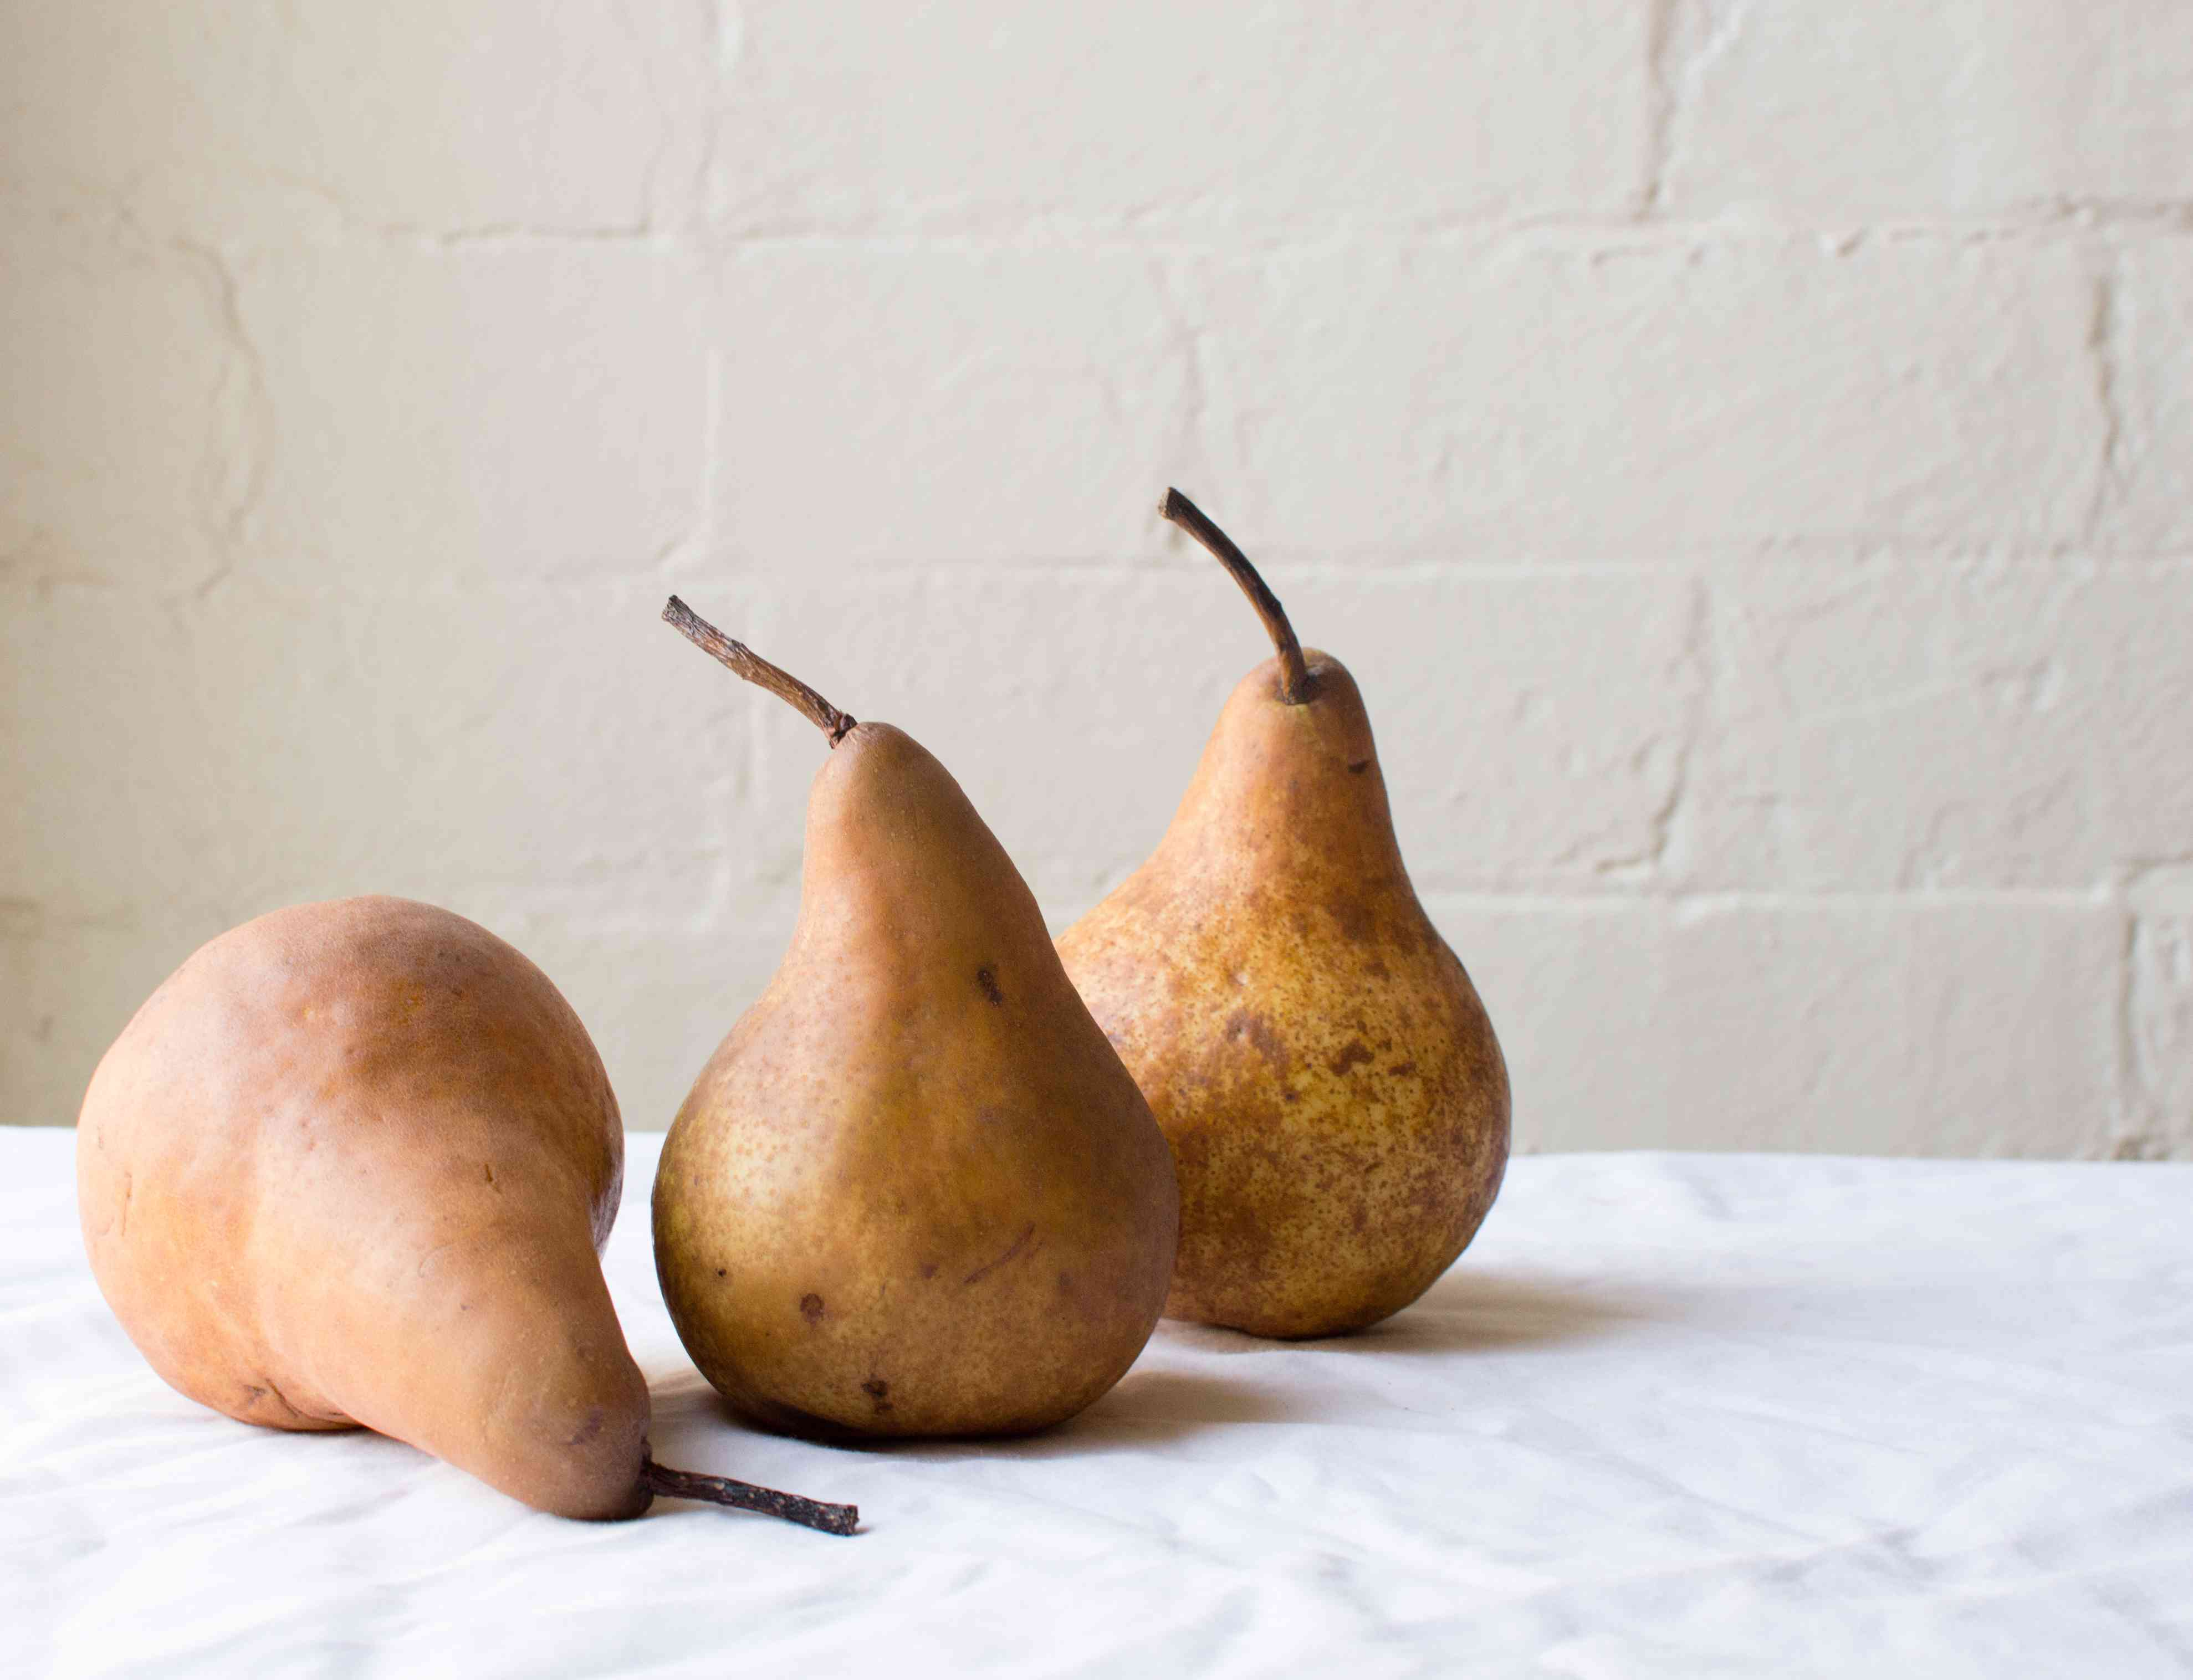 three Bosc pears against white wall